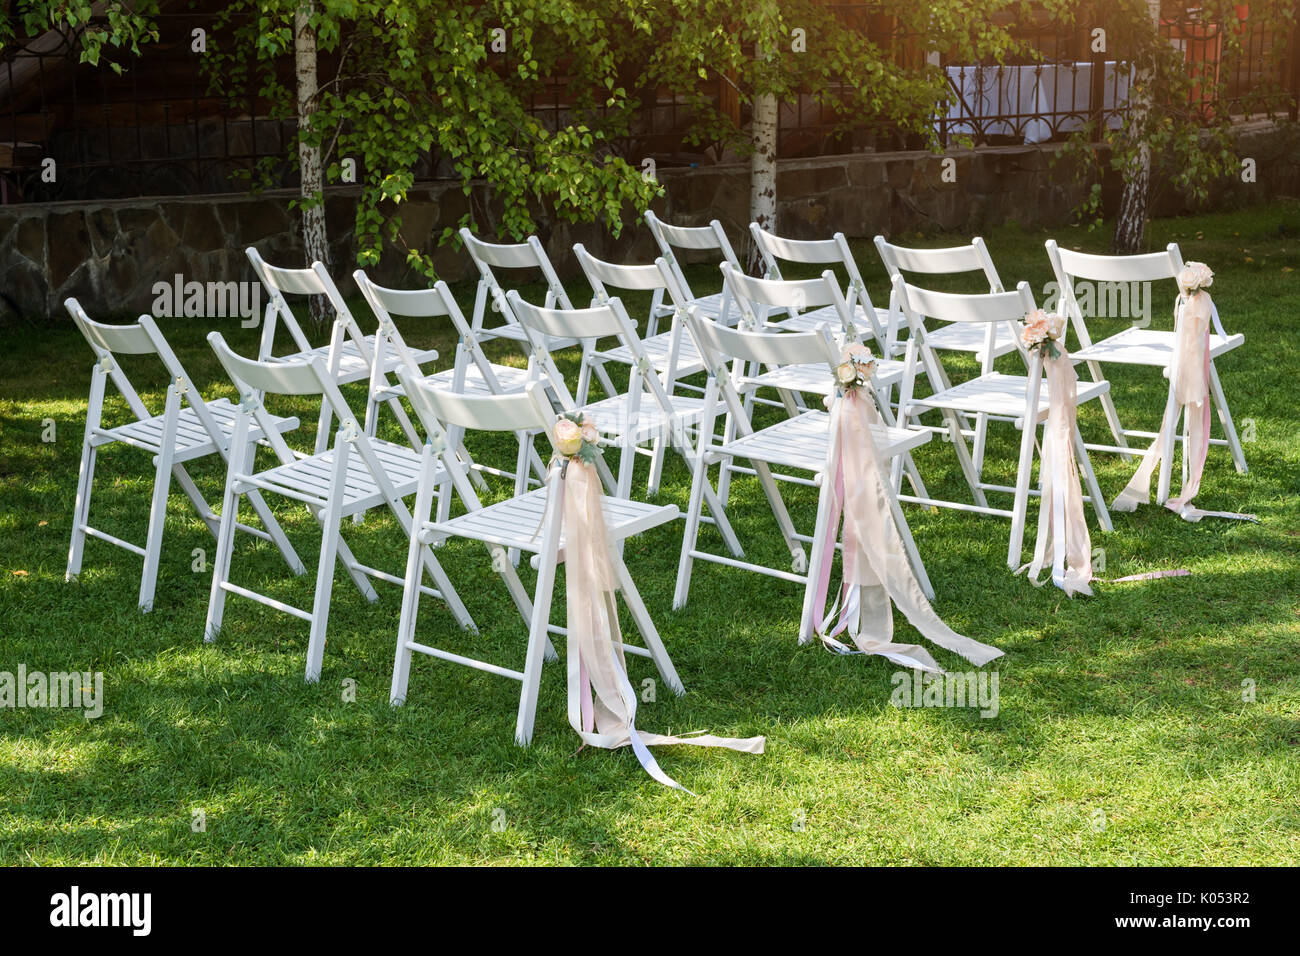 Wood Chairs Outdoor Ceremony: Beautiful Wedding Set Up. Wedding Ceremony In The Garden